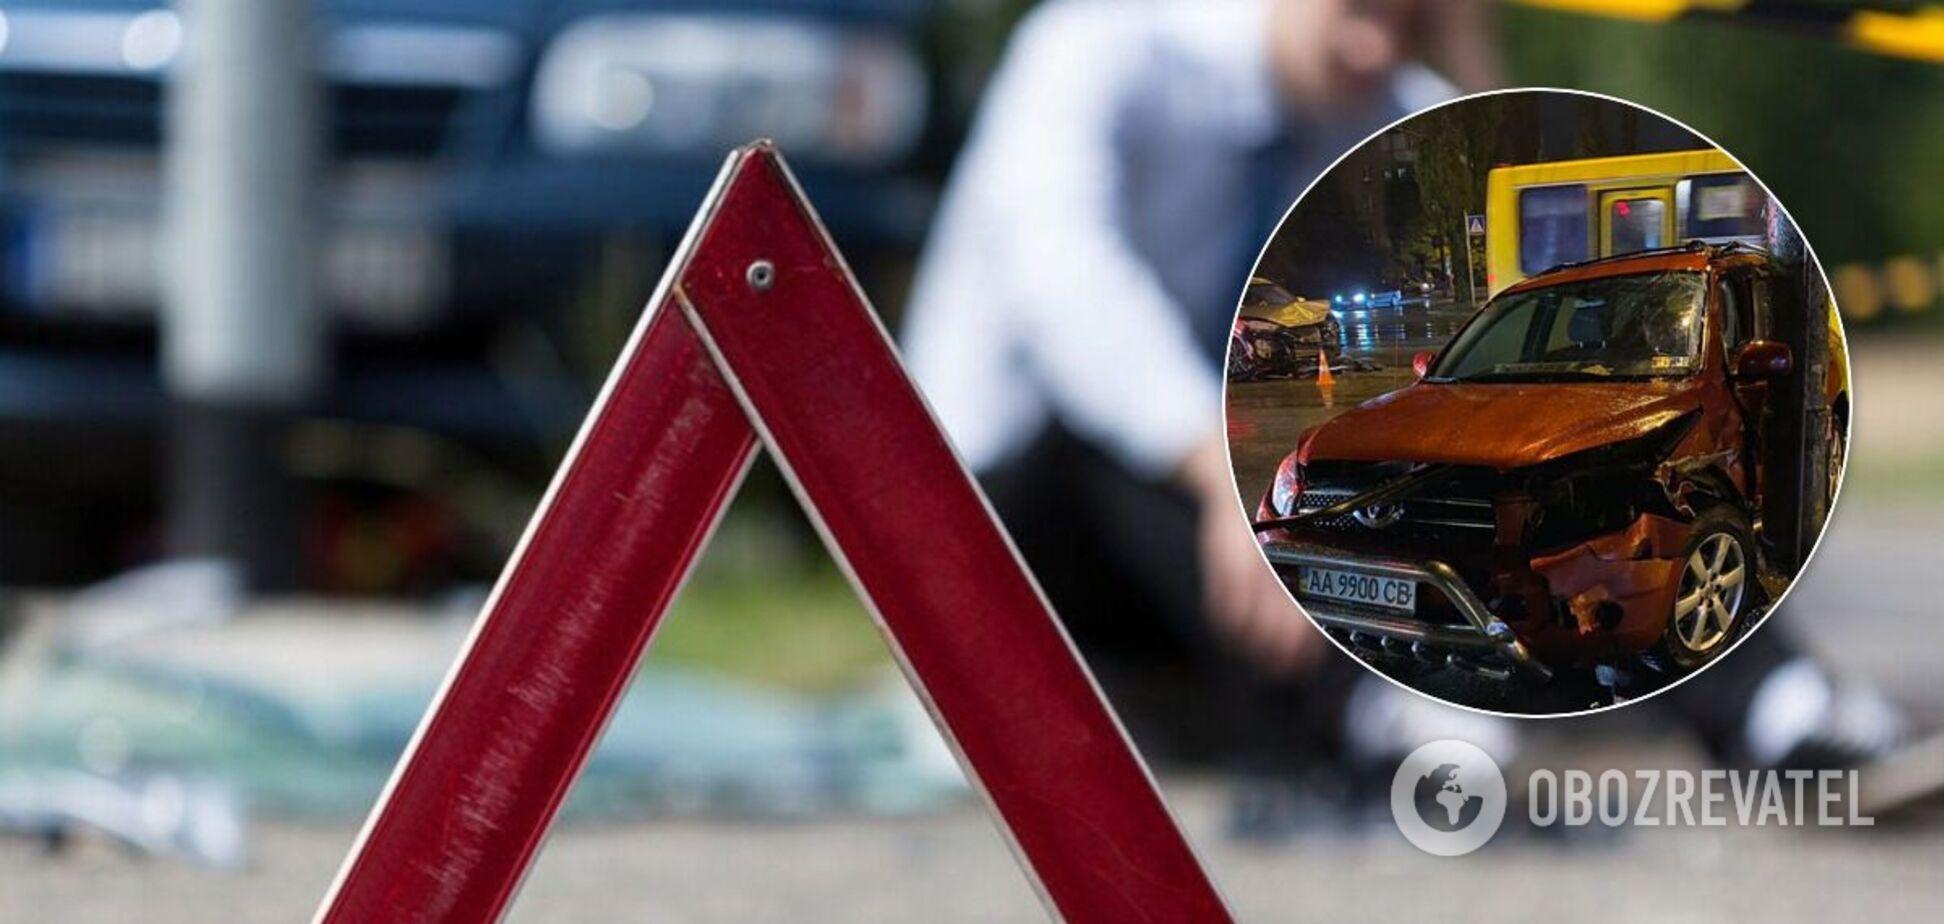 В ДТП на Виноградаре пострадал подросток